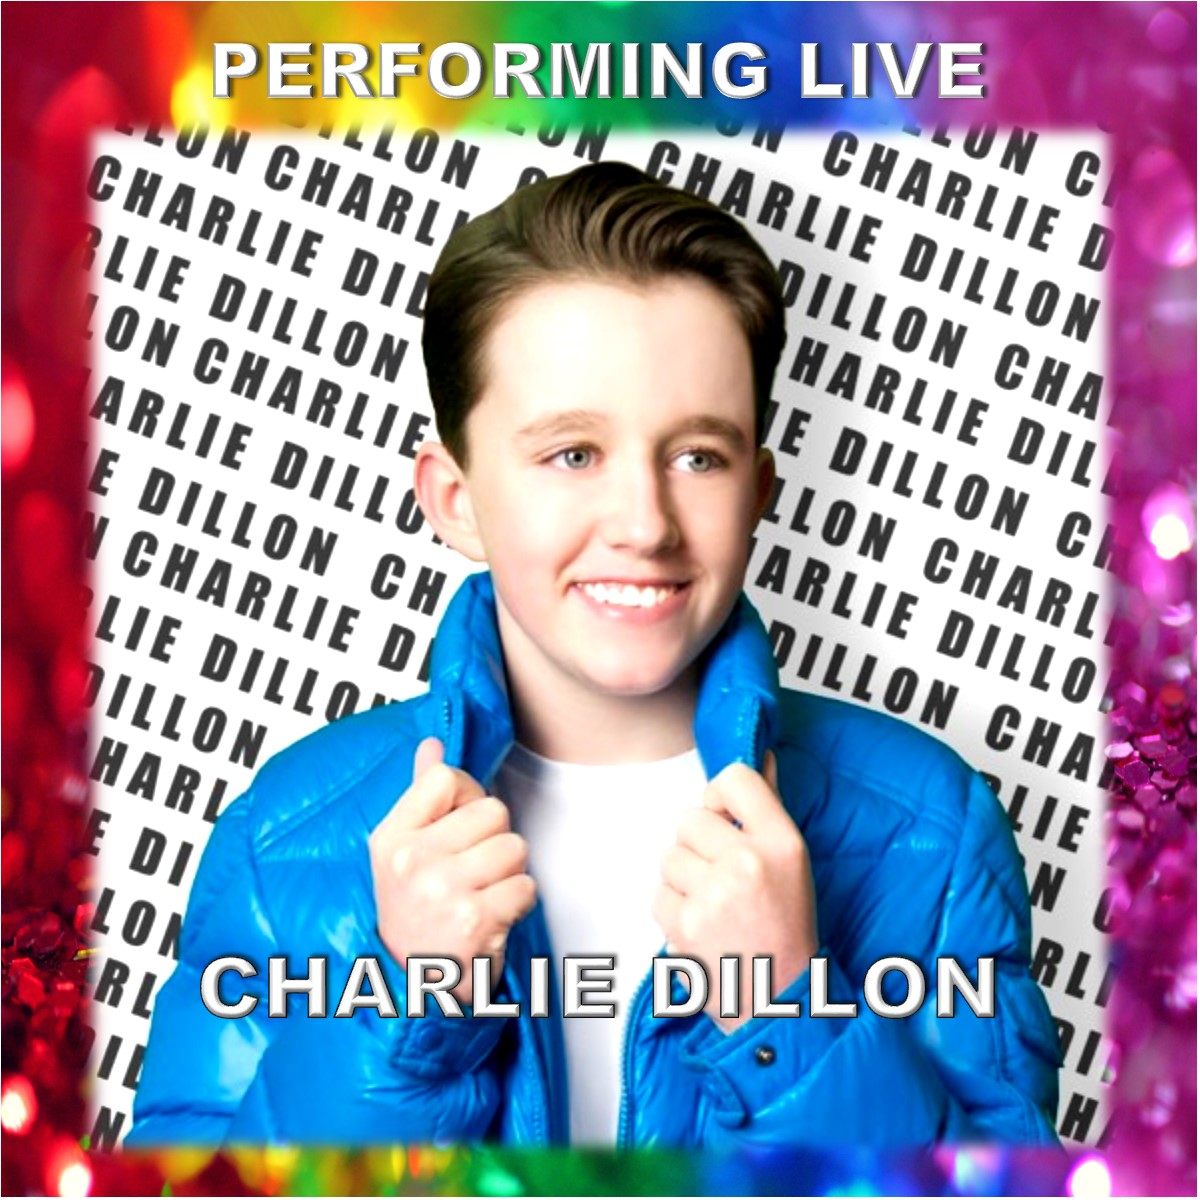 Charlie Dillon